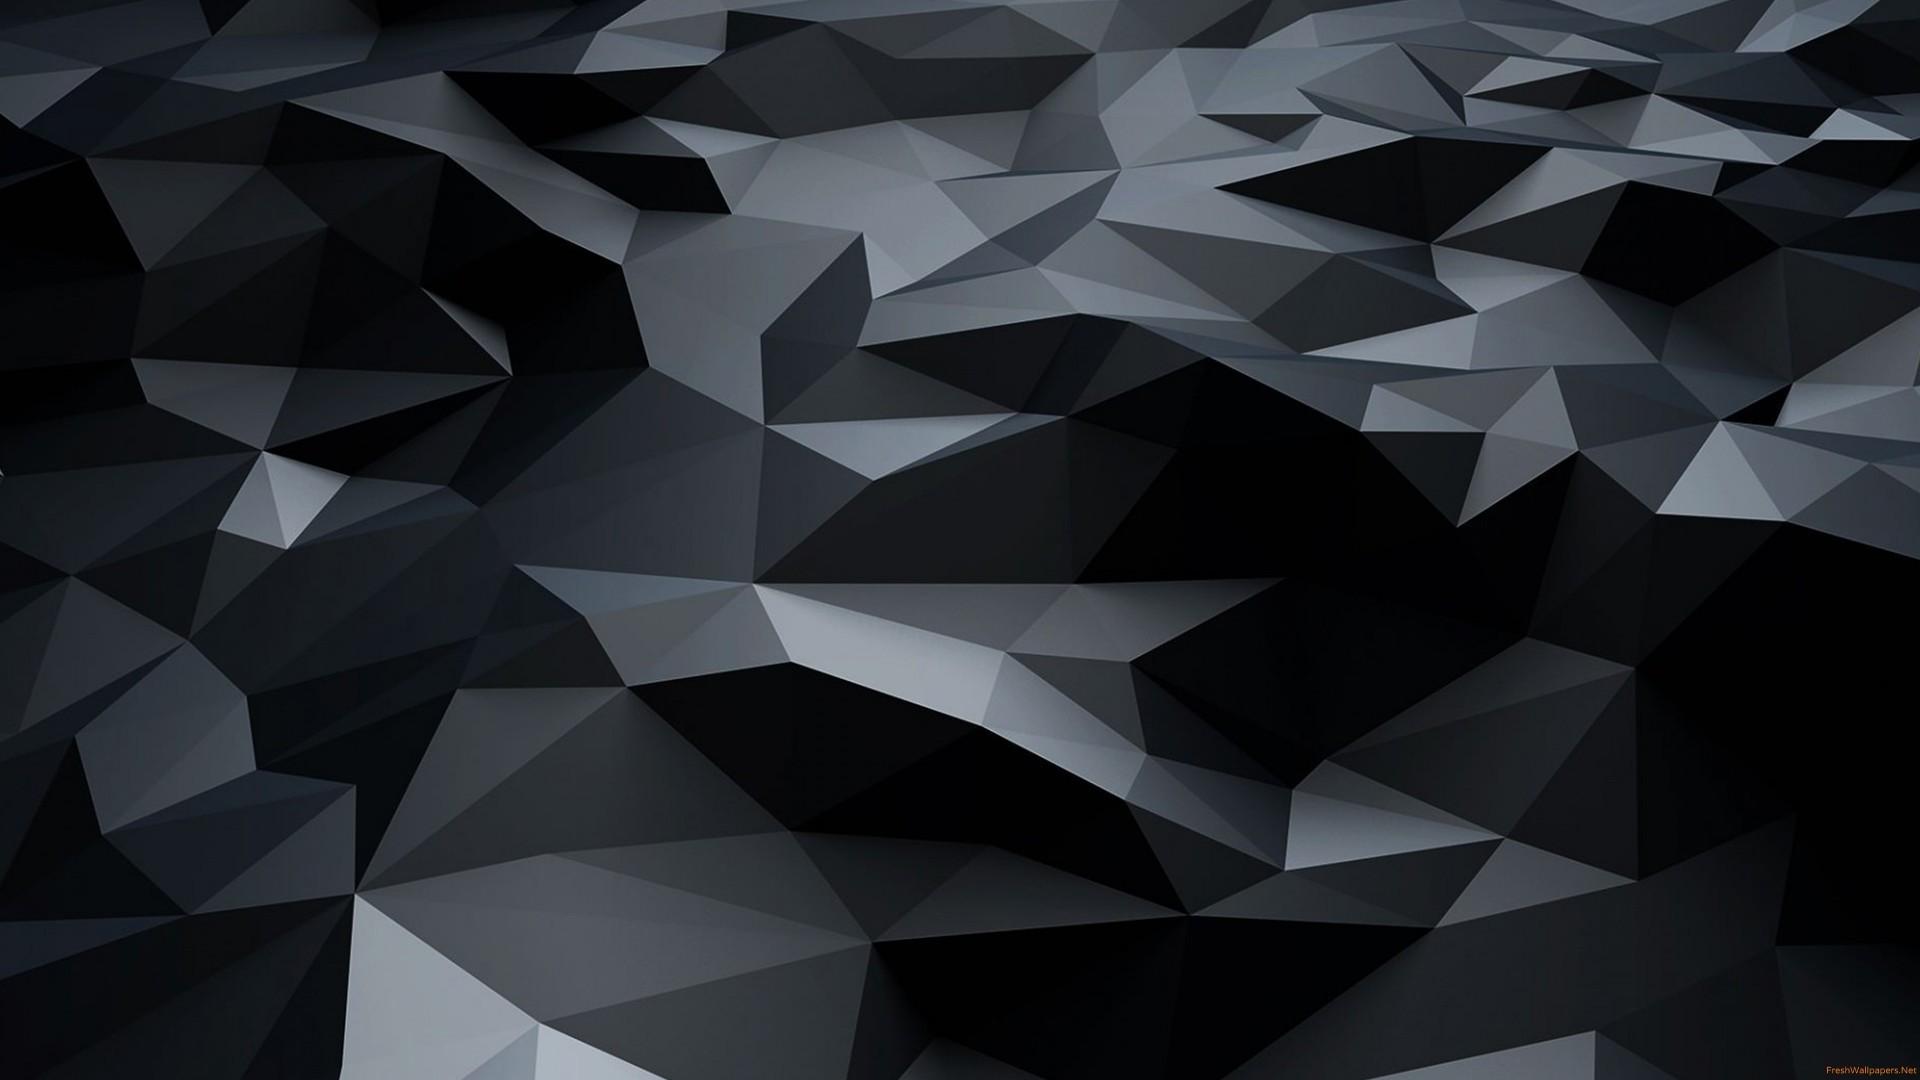 … High Resolution Dark Wallpapers Group (7)